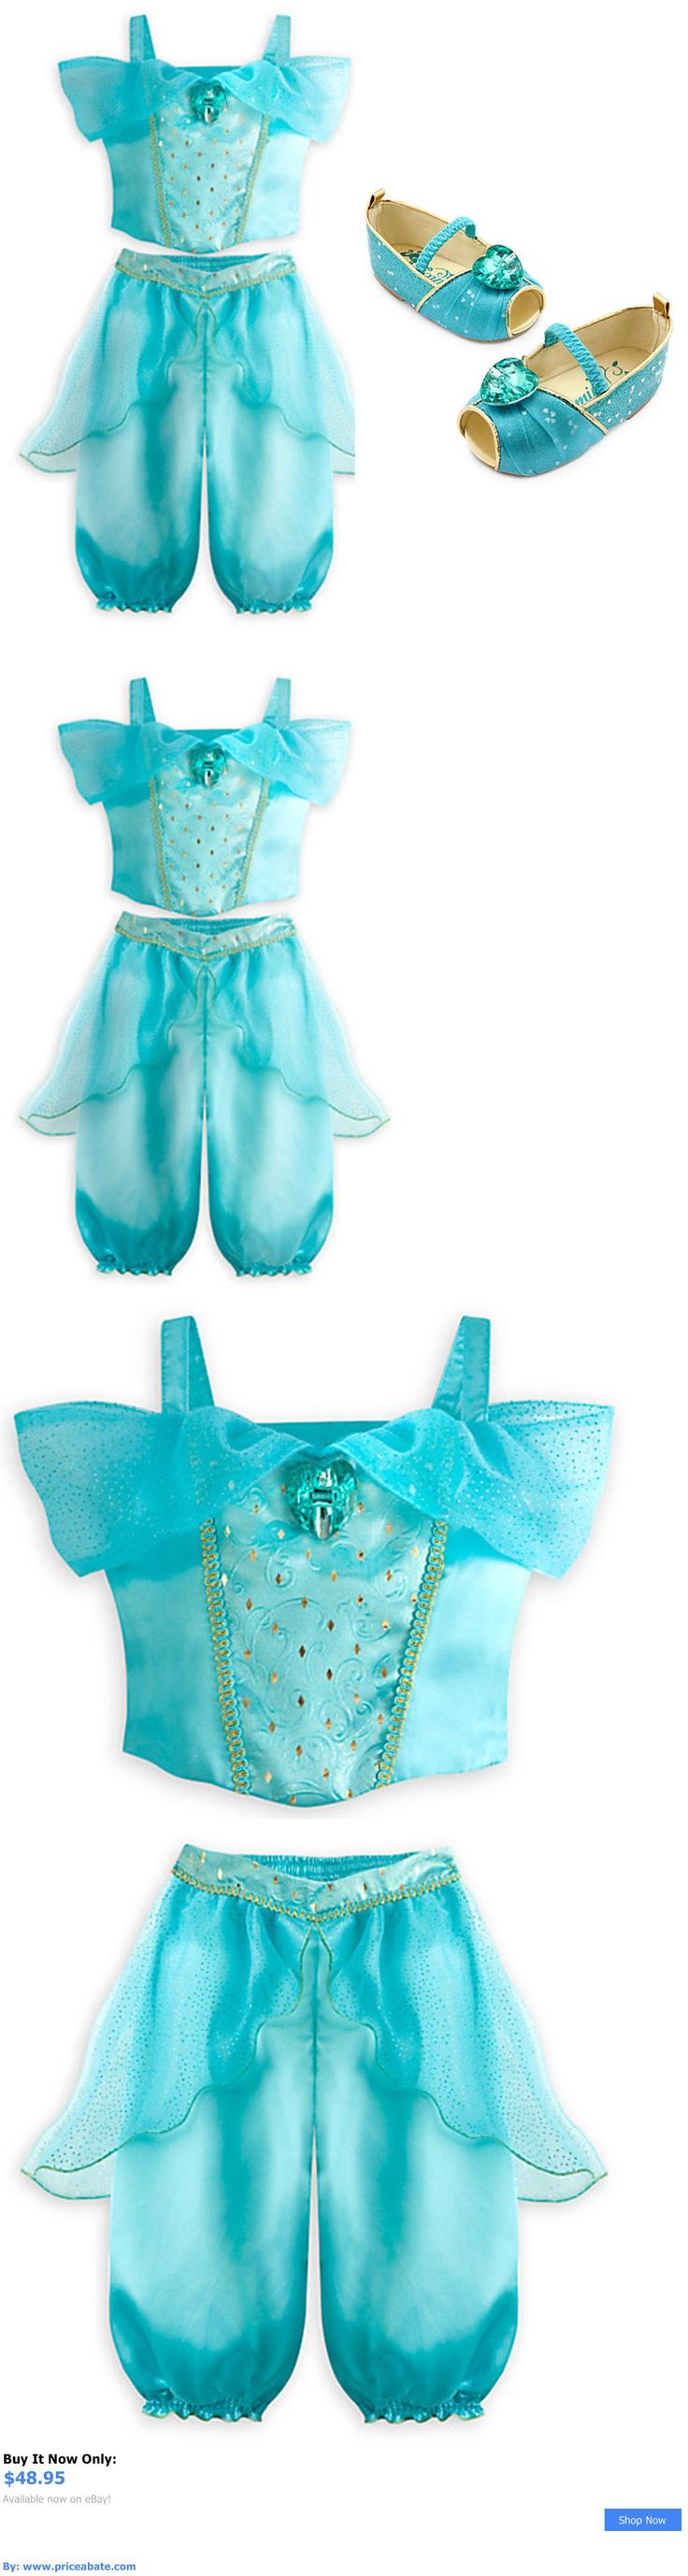 Kids Costumes: Disney Store Aladdin Princess Jasmine Blue Costume Baby/Toddler 18-24 Months BUY IT NOW ONLY: $48.95 #priceabateKidsCostumes OR #priceabate